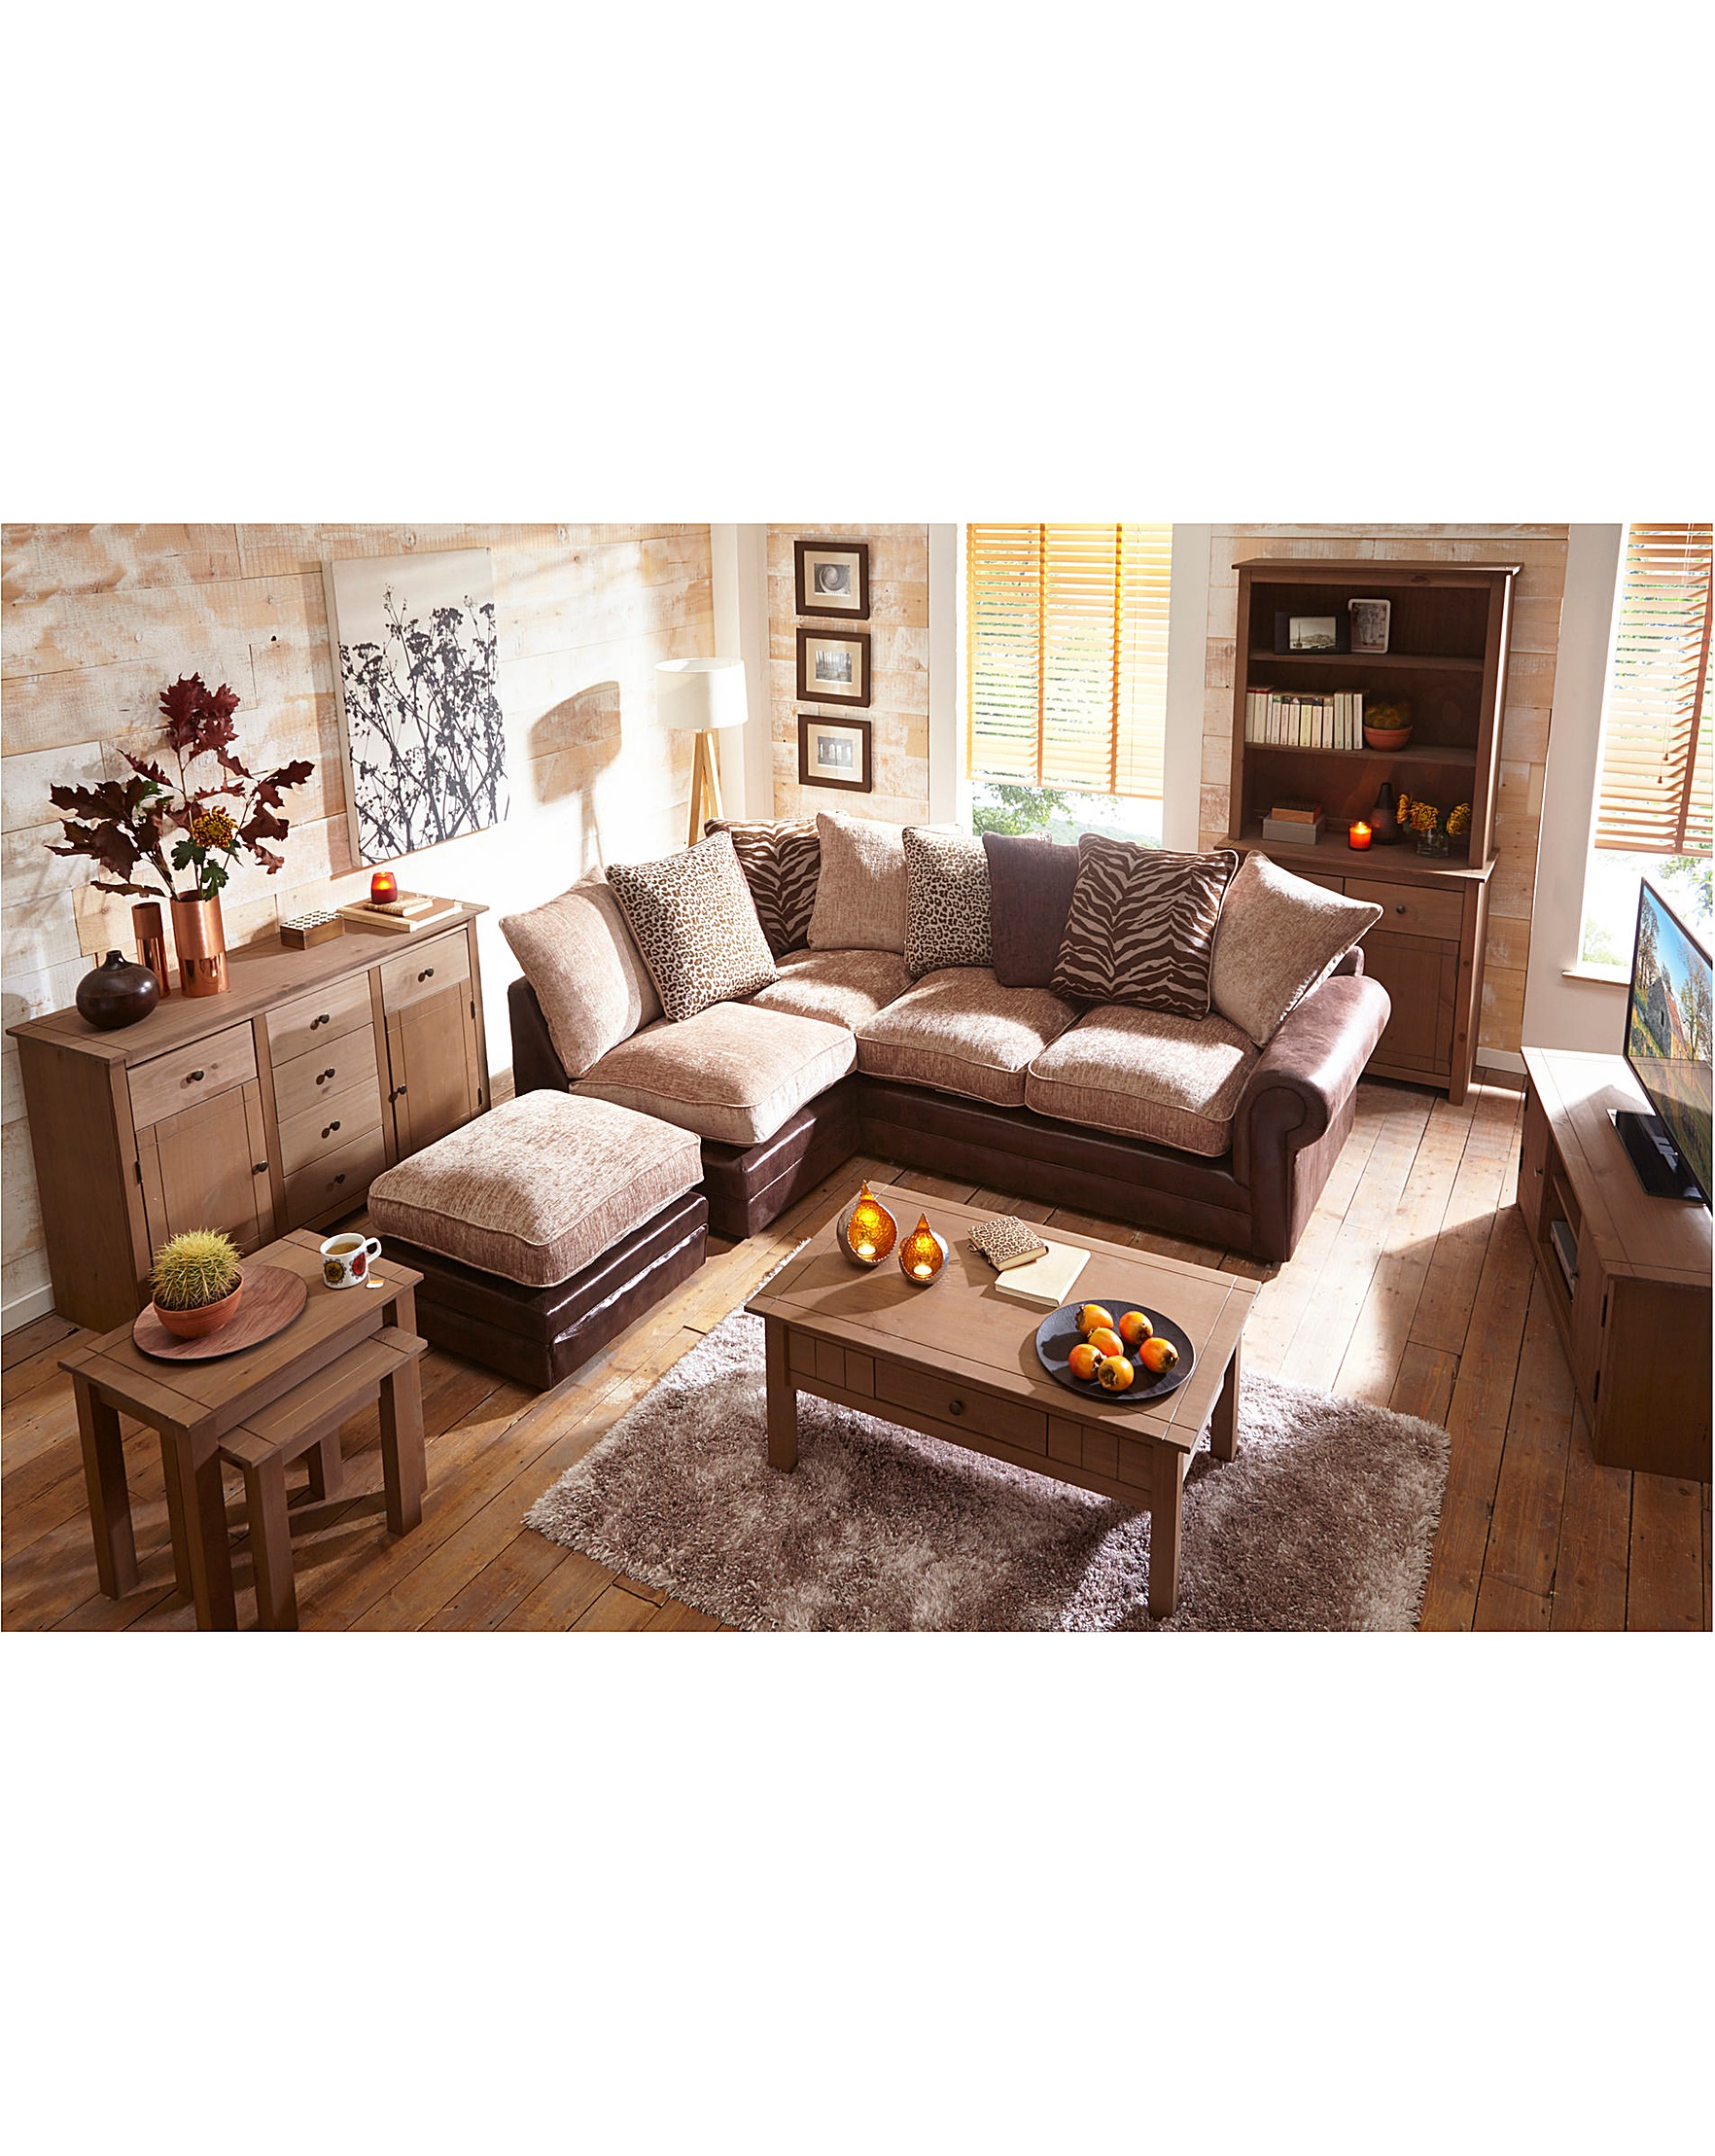 Cuban Living Room Furniture Package   Fashion World. Living Room Furniture Packages With Tv. Home Design Ideas